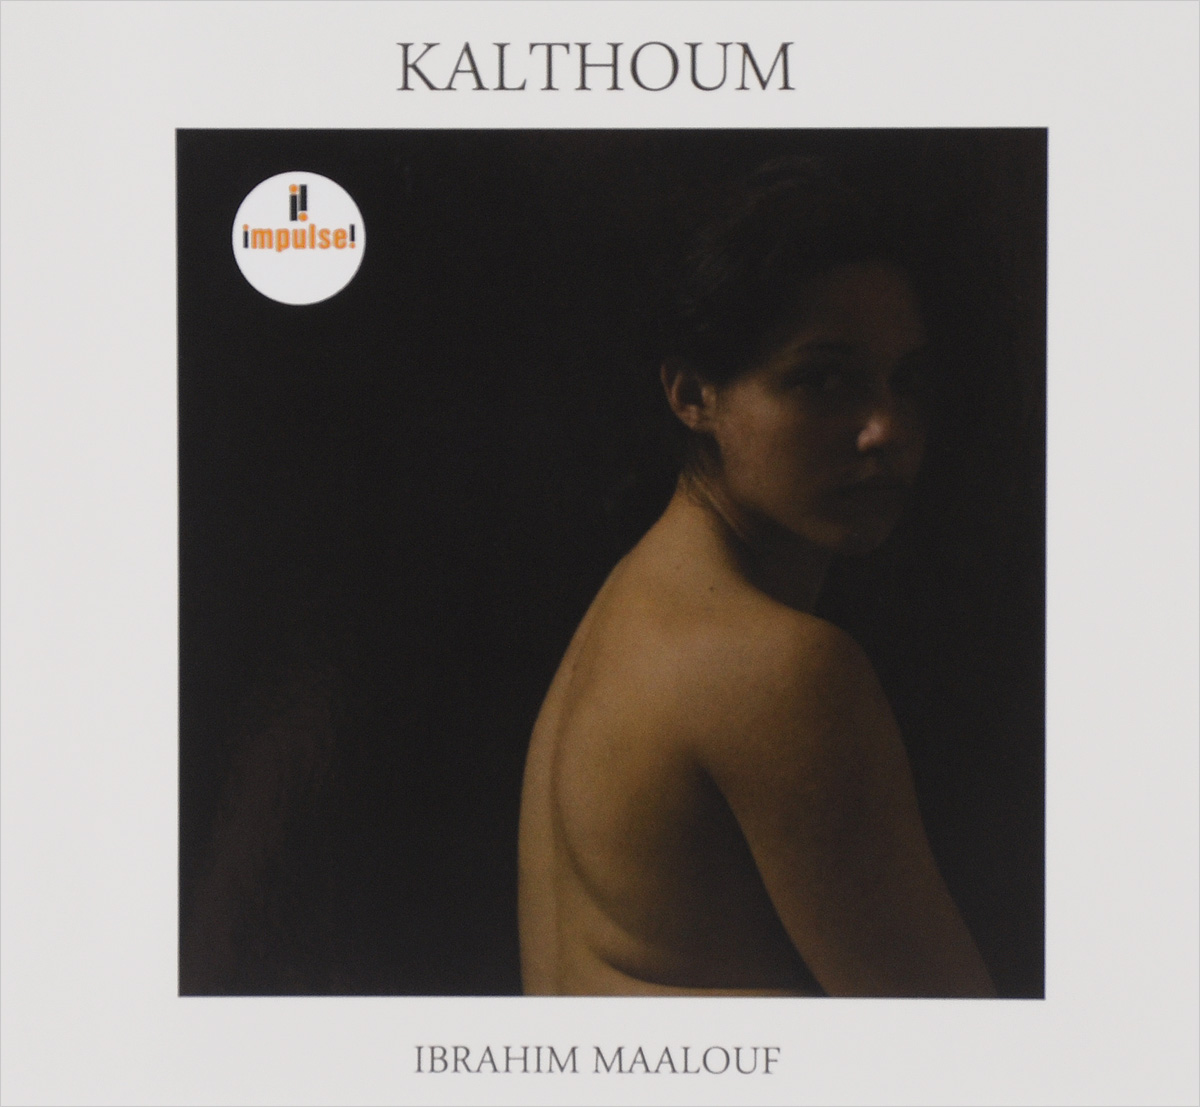 Ibrahim Maalouf. Kalthoum